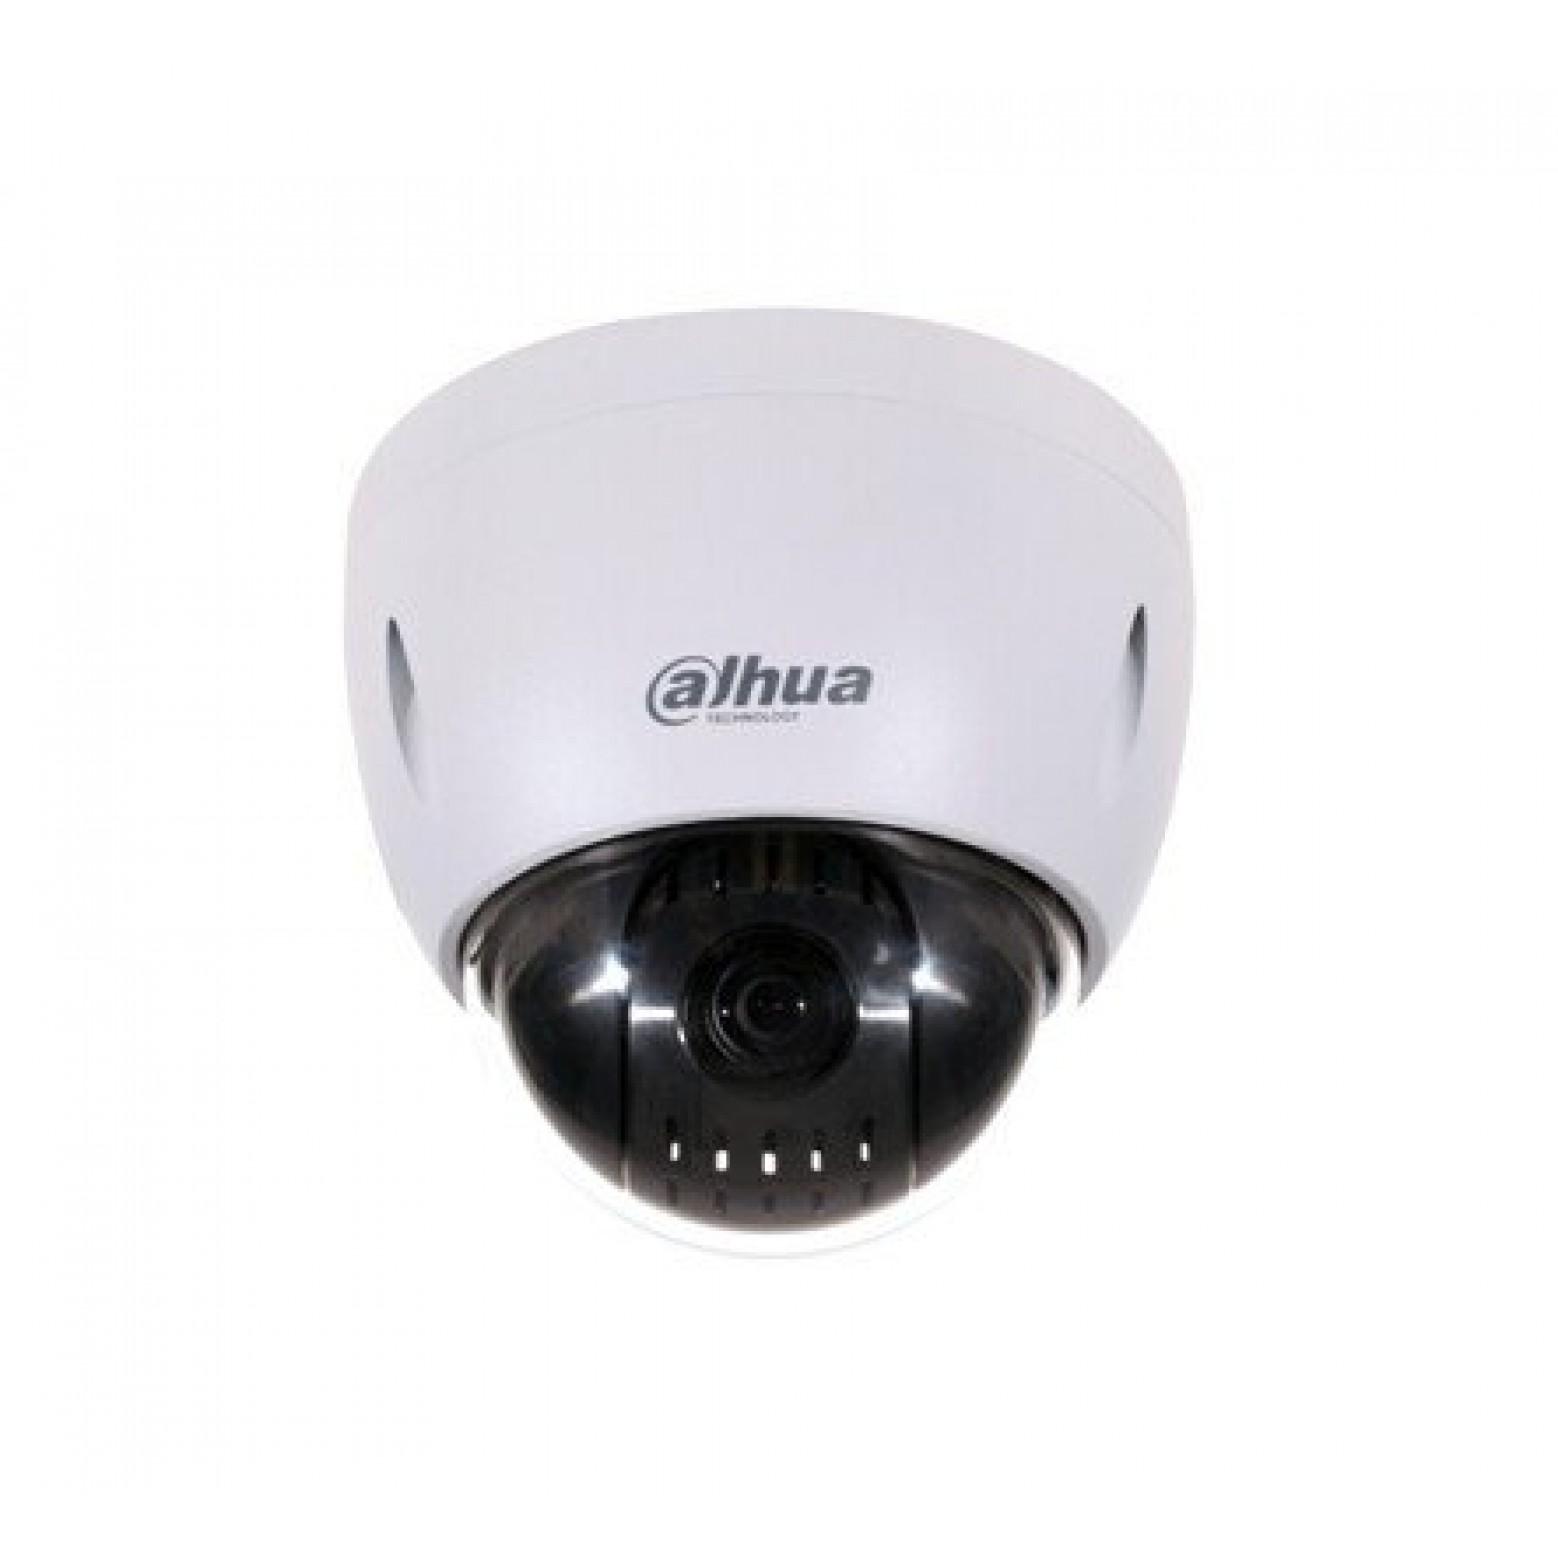 Dahua SD42212I-HC-S3 2MP mini HD-CVI 12x zoom Starlight PTZ Dome Camera